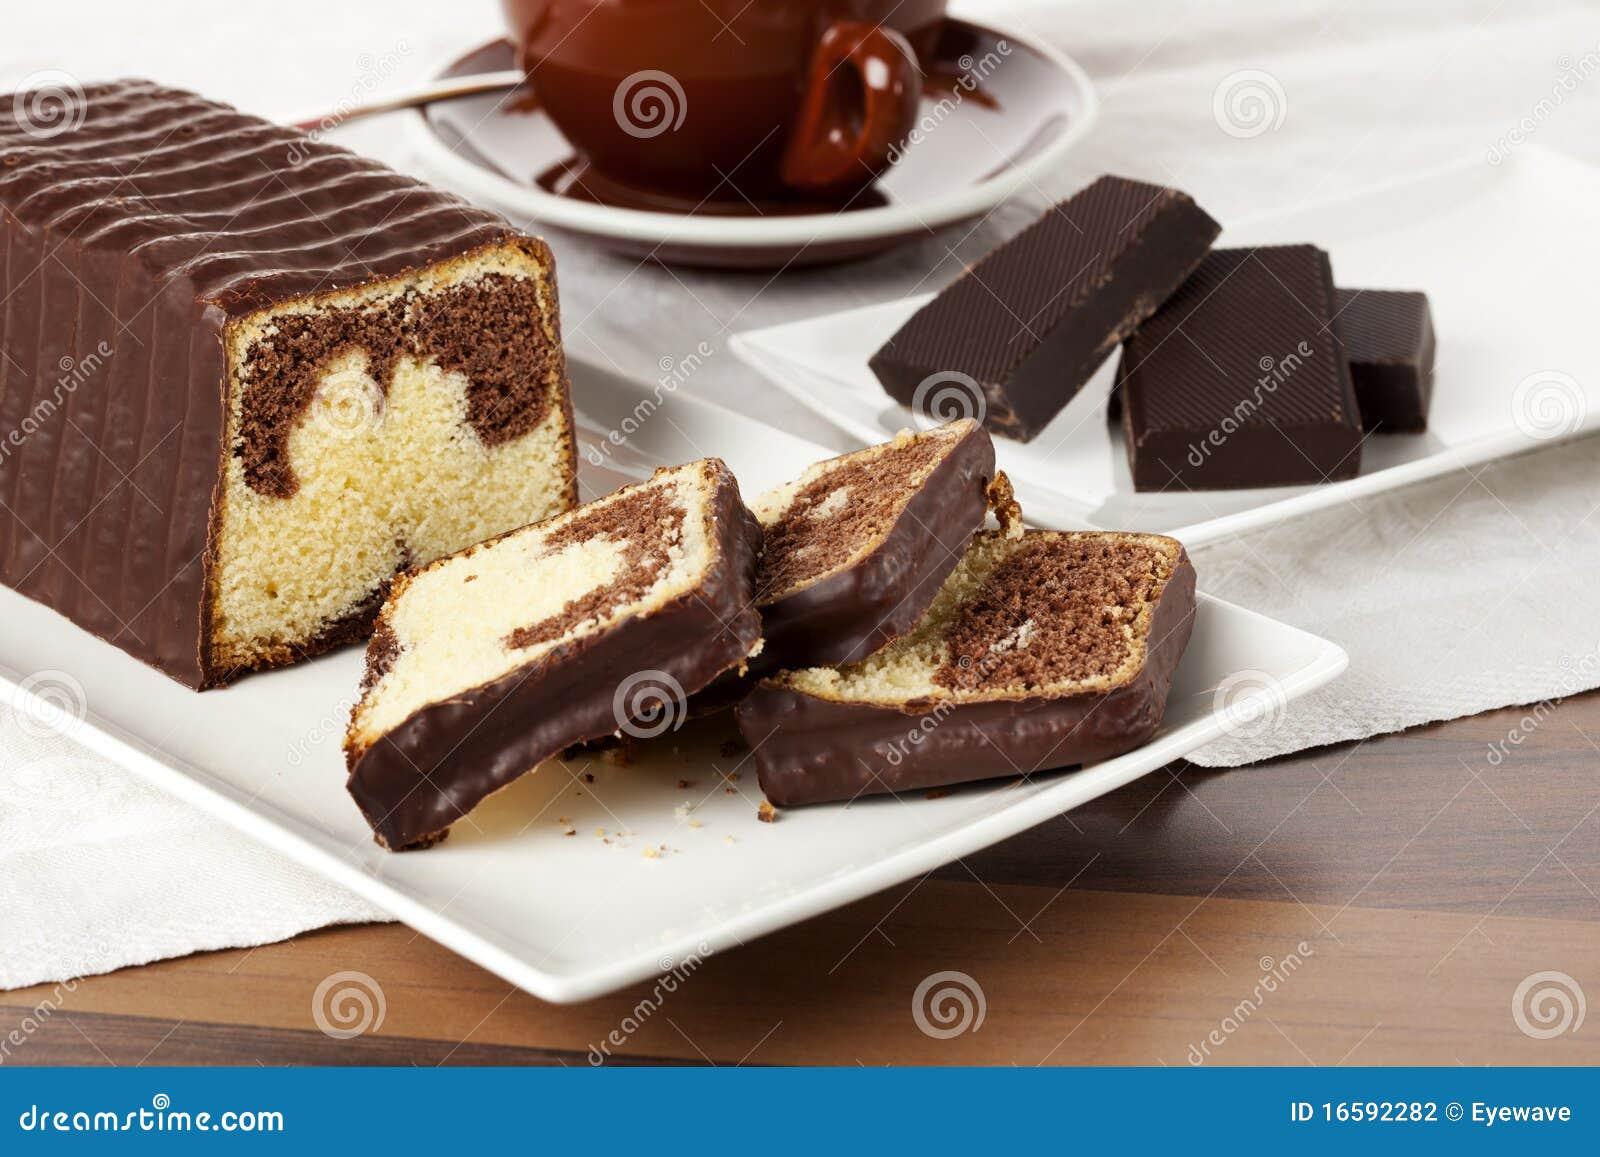 Coffee Chocolate Marble Cake Recipe